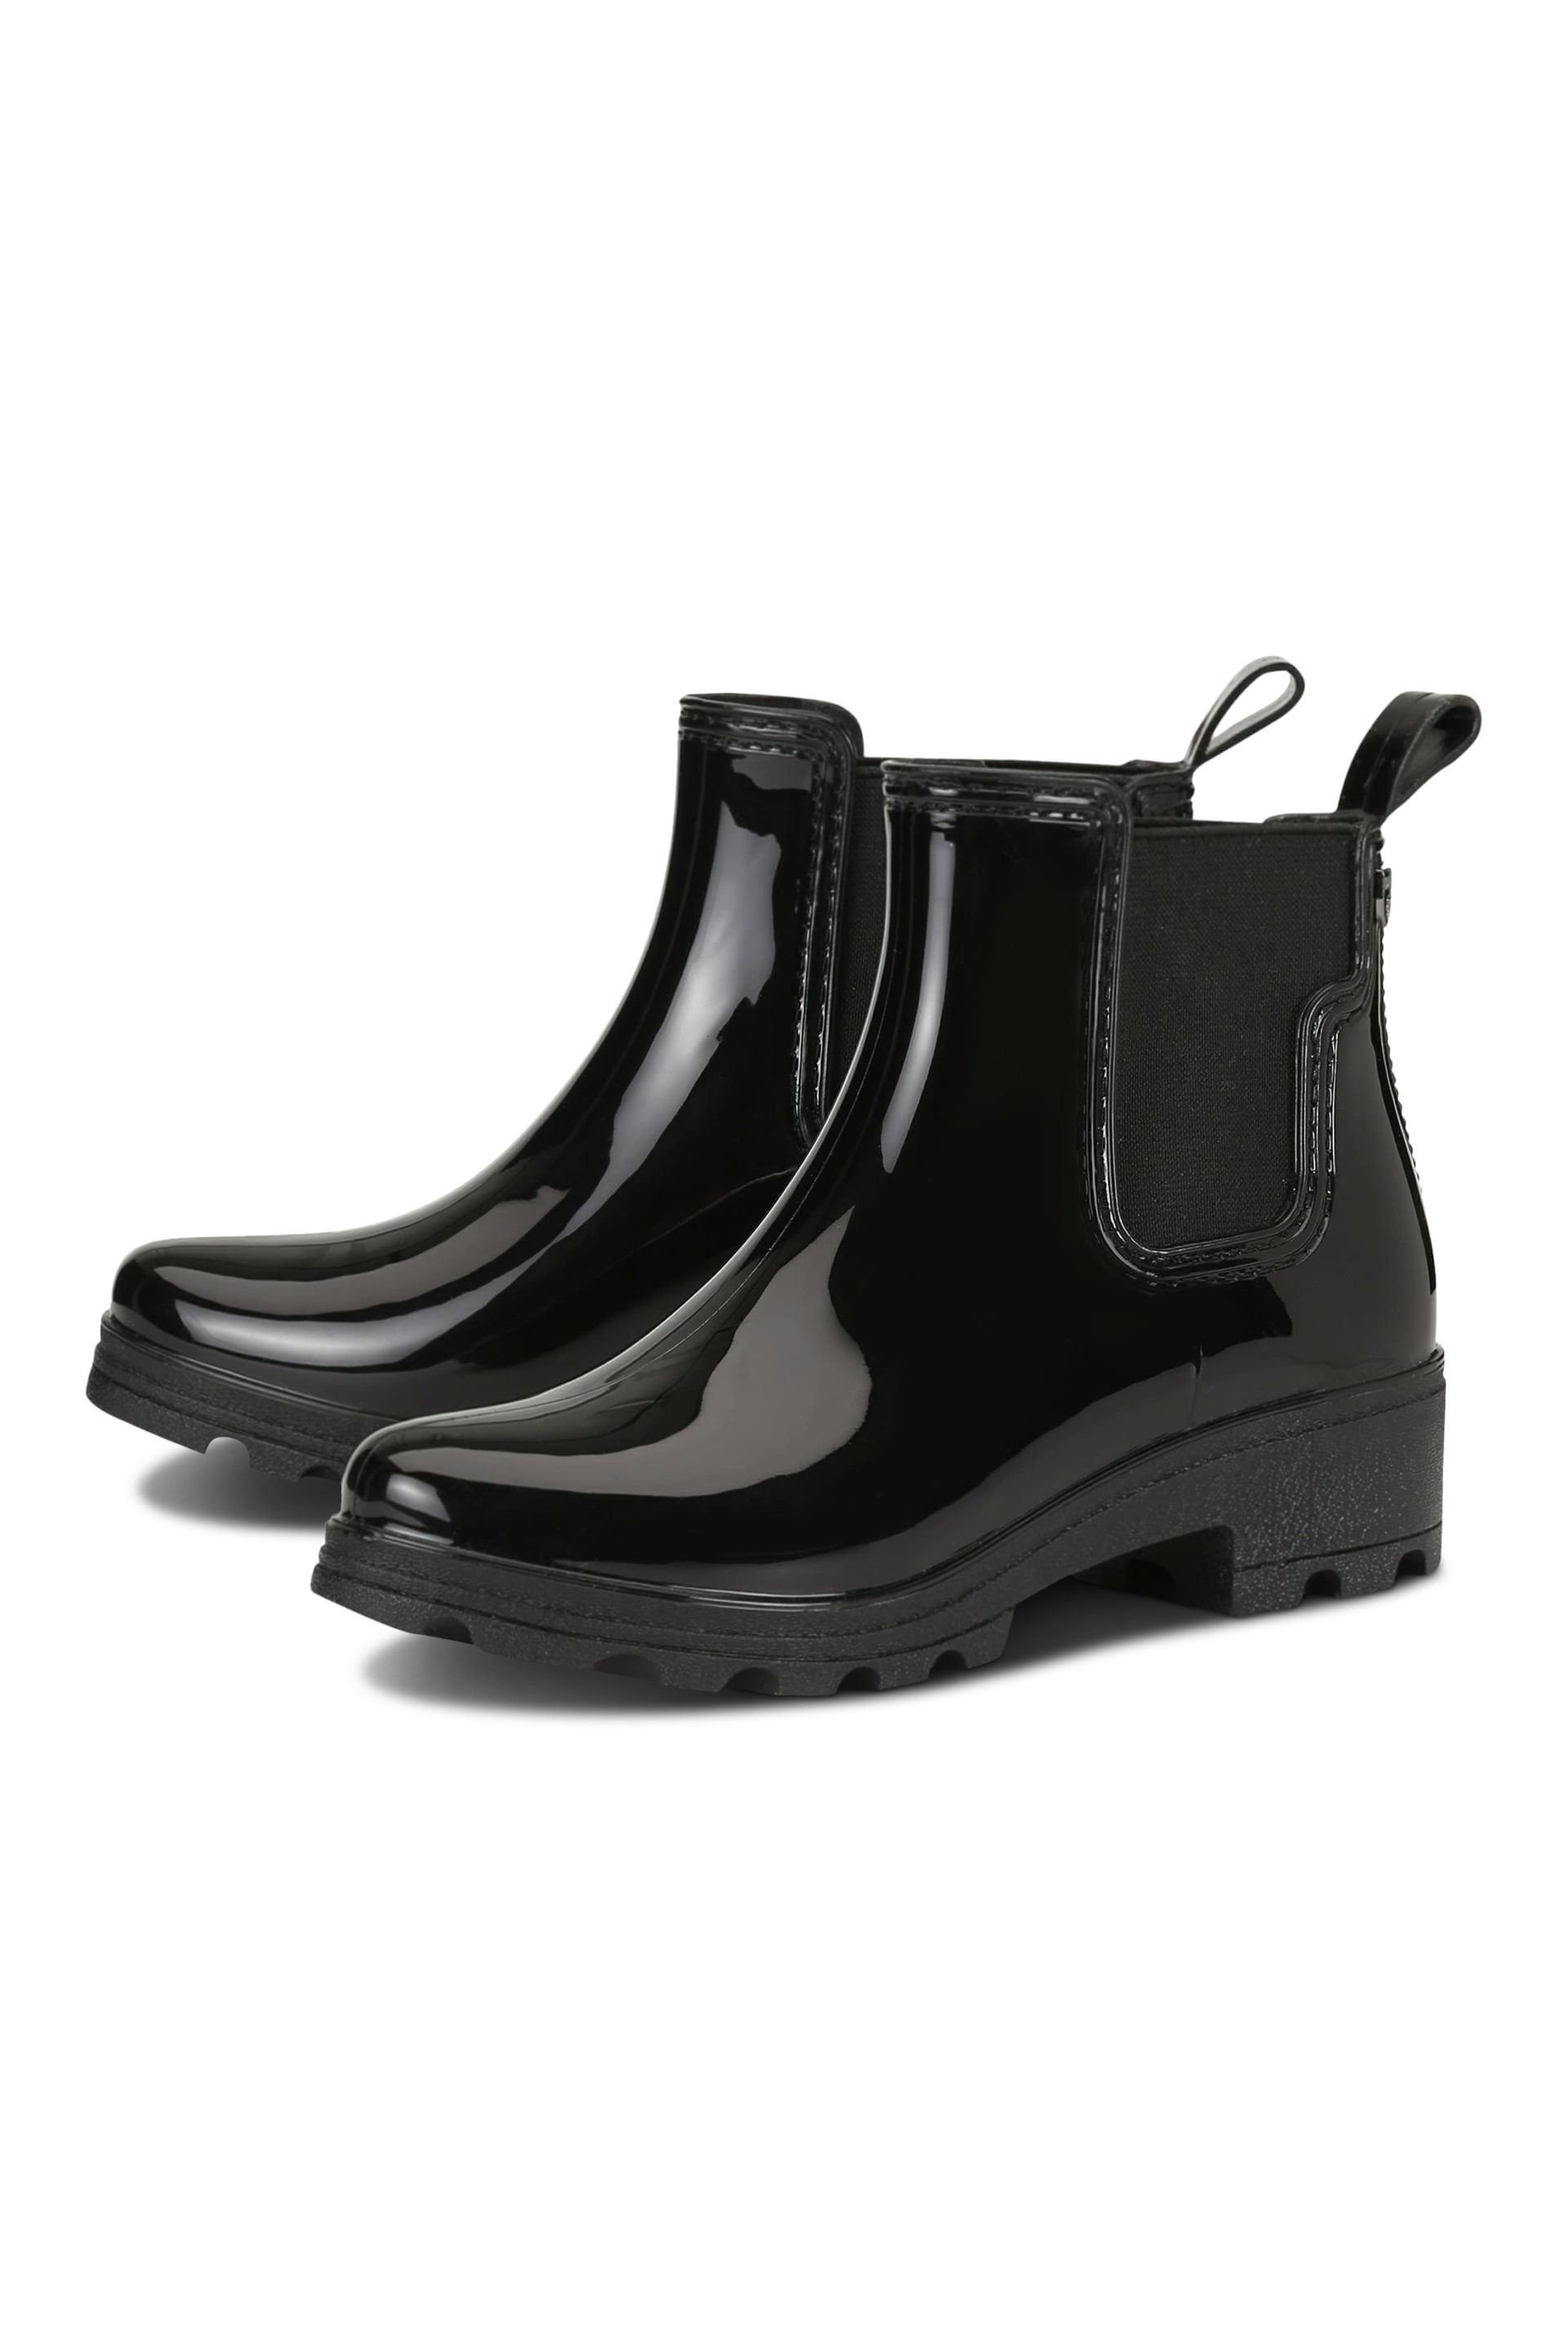 Black shiny ankle rainboots